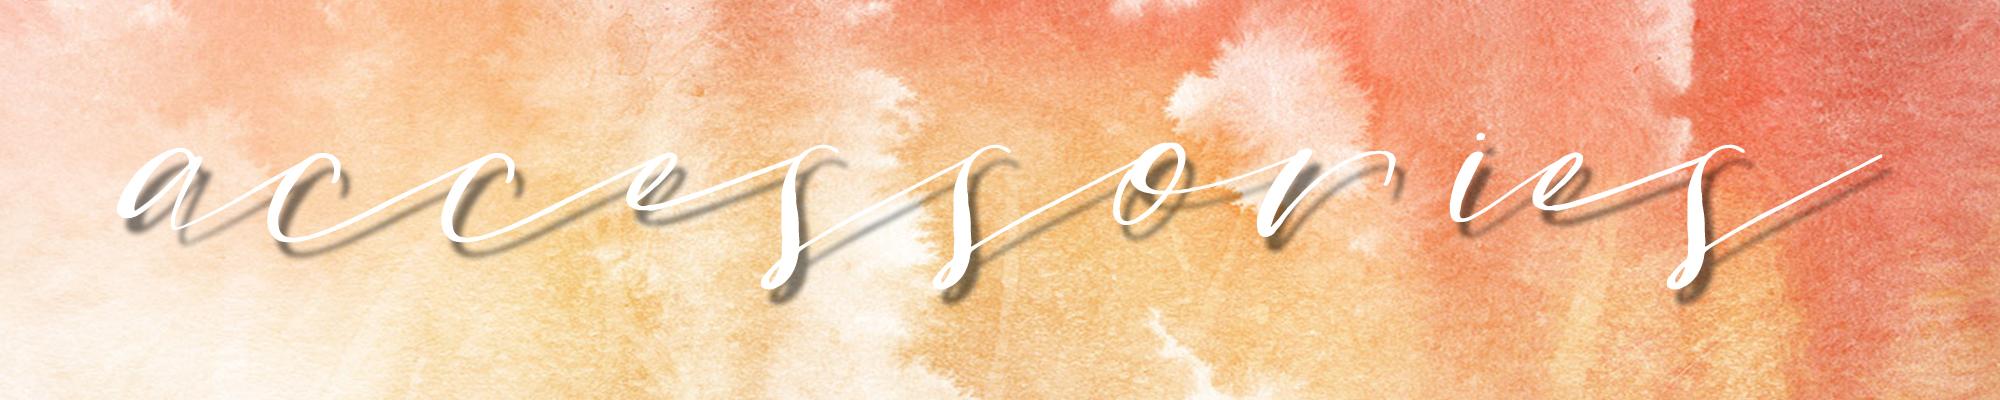 acc-2021-banner.jpg